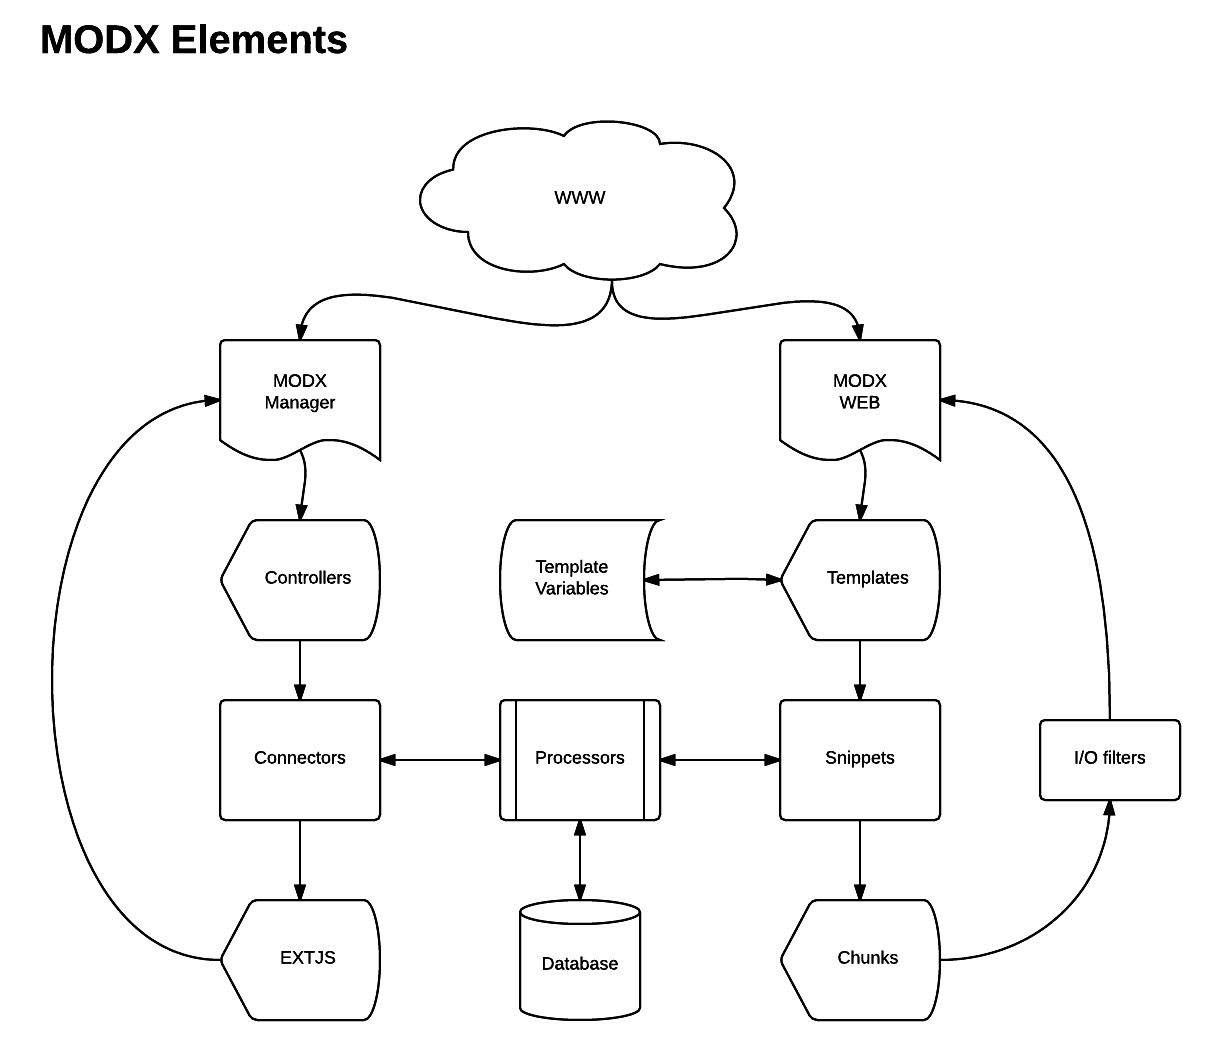 MODX elements